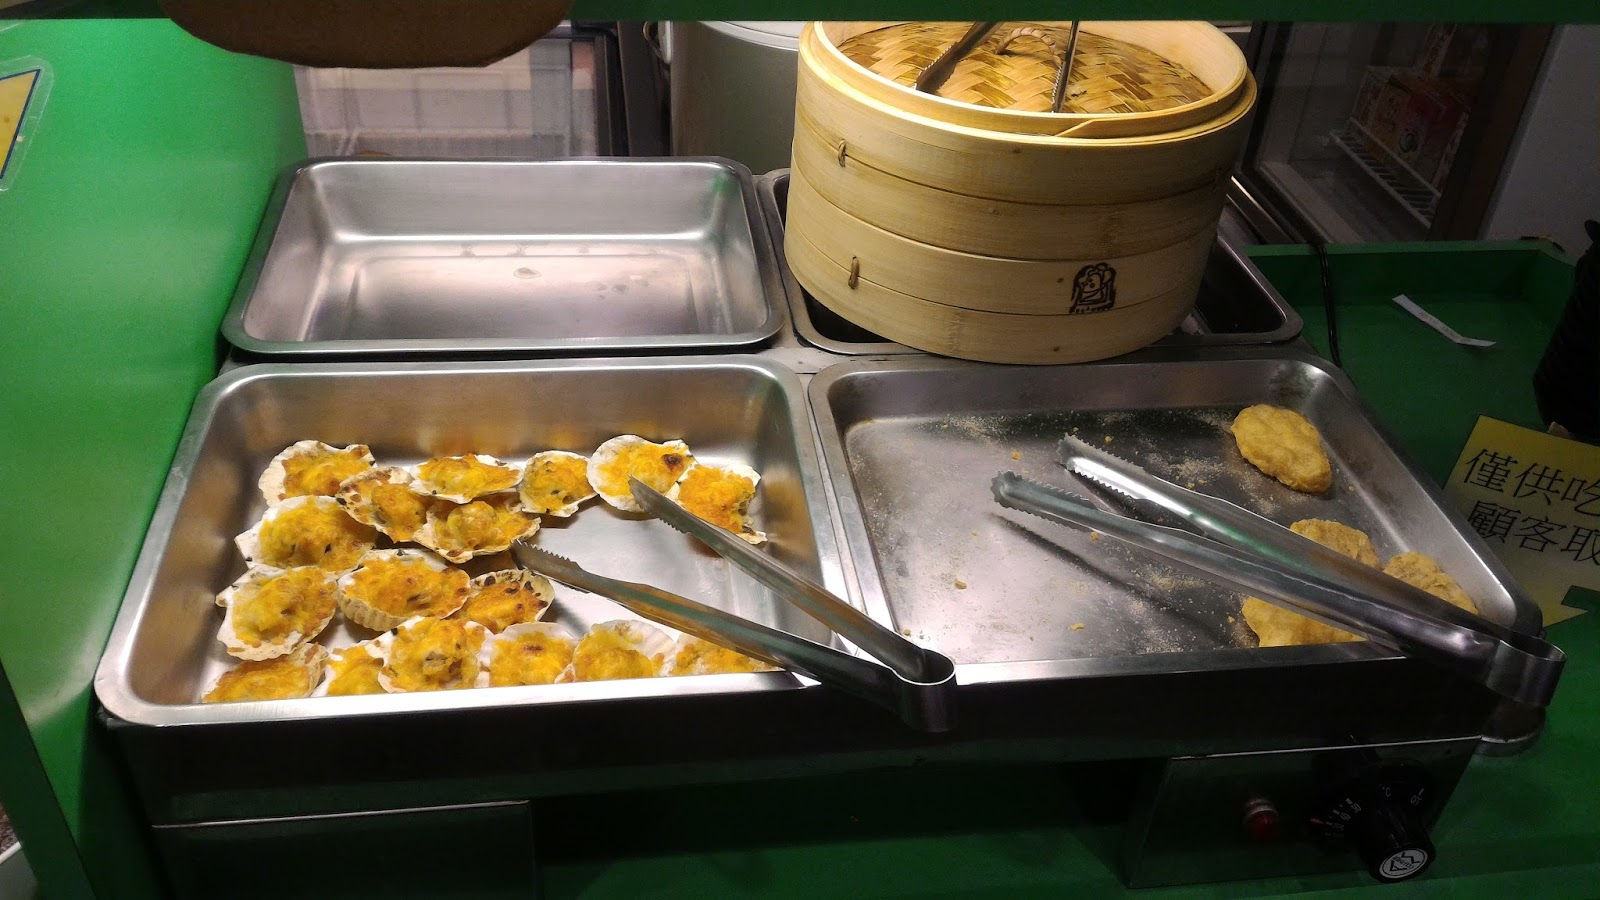 P 20160725 181729 - [食記] 廣香吃到飽日式涮涮鍋,超多種飲料、冰品及甜點!